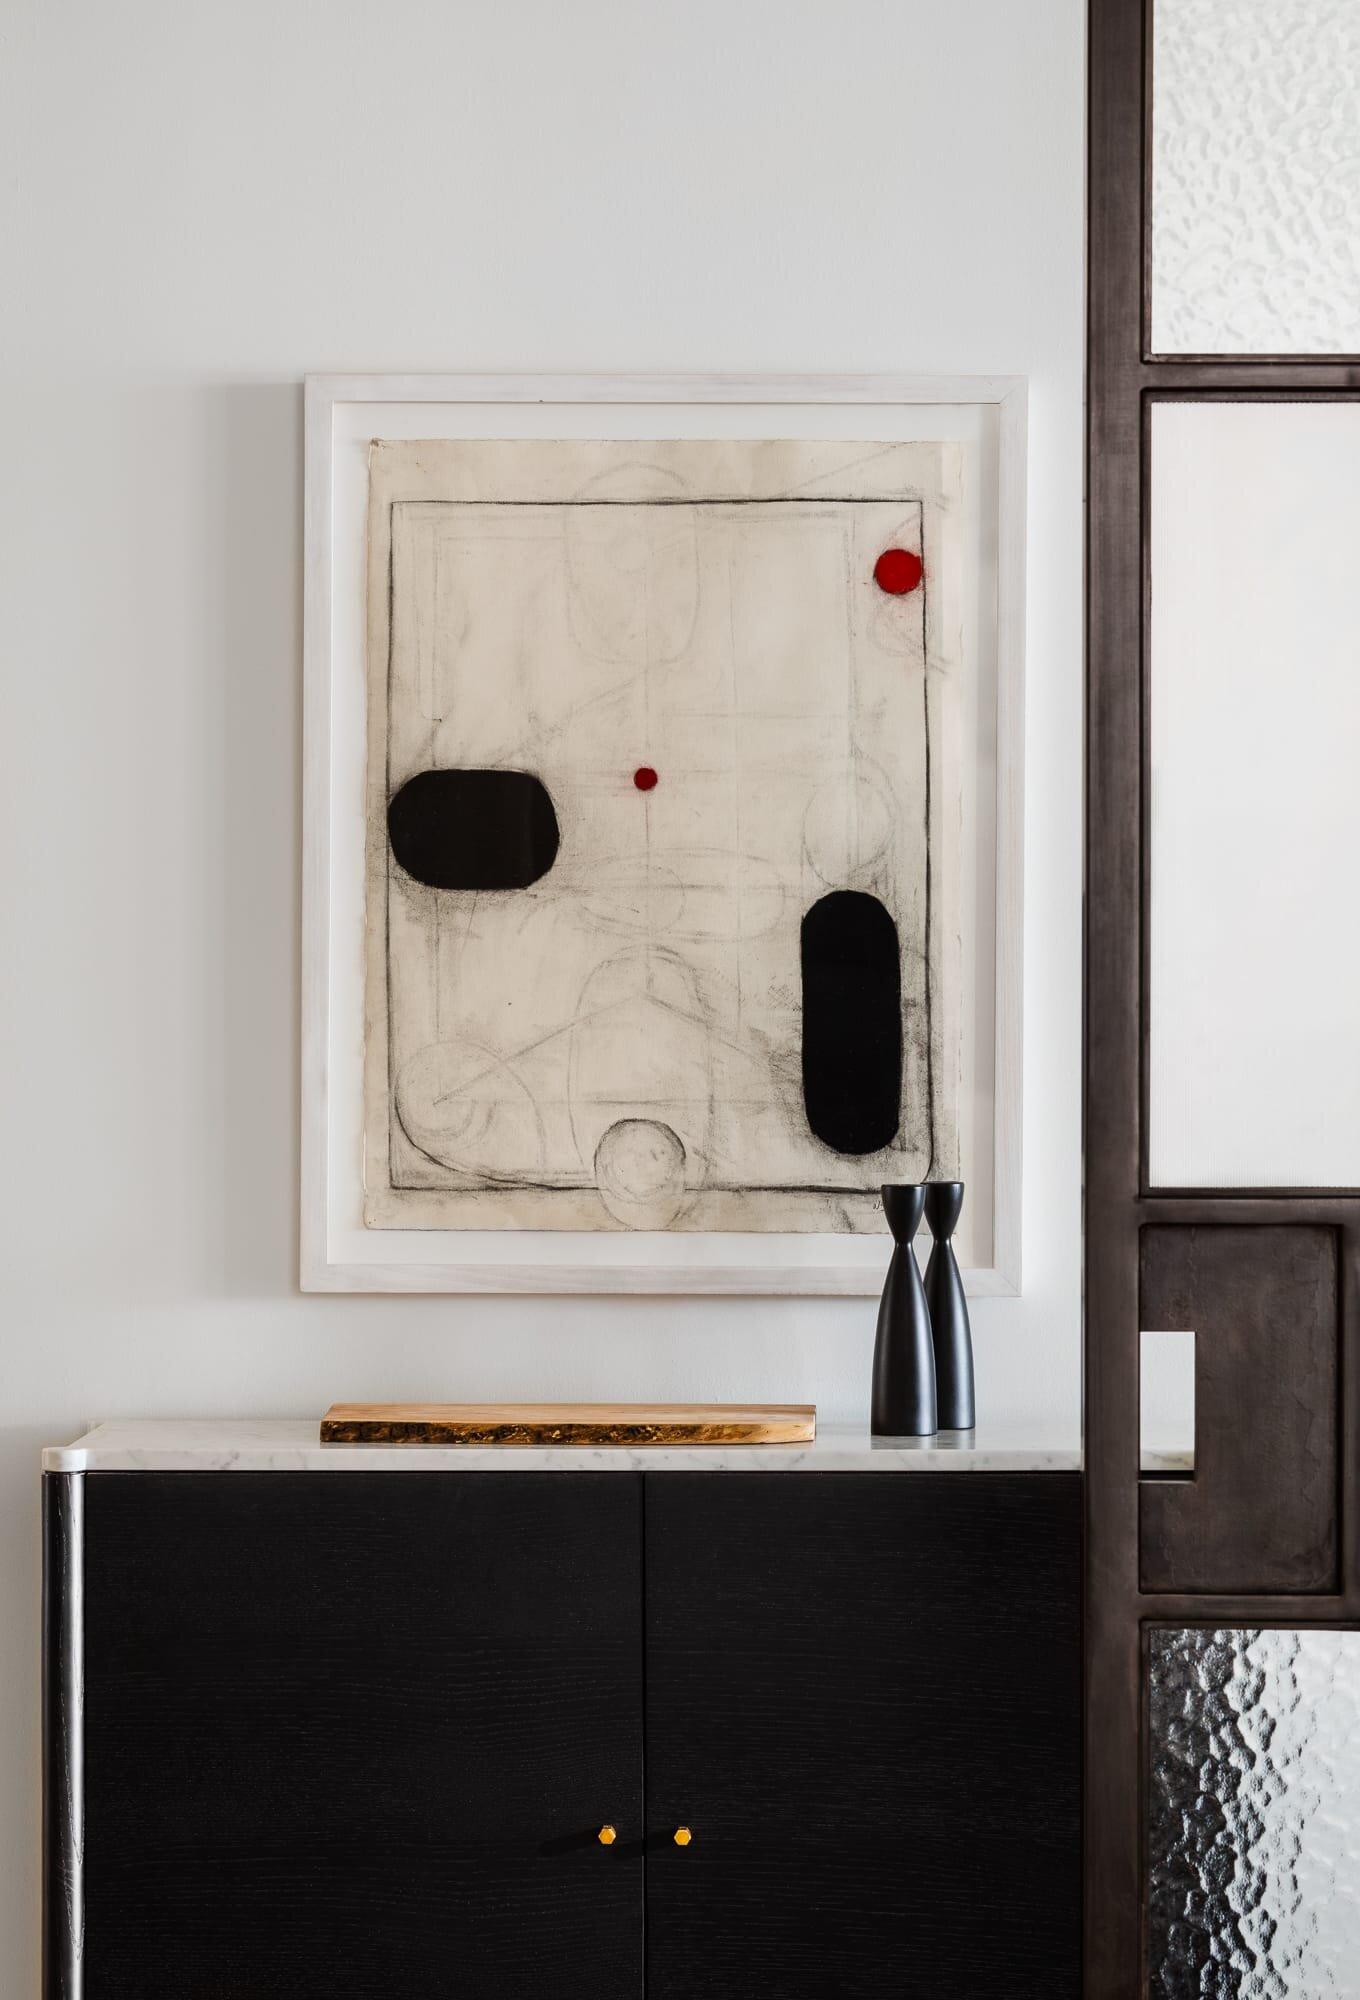 Interior details by Alloy Development